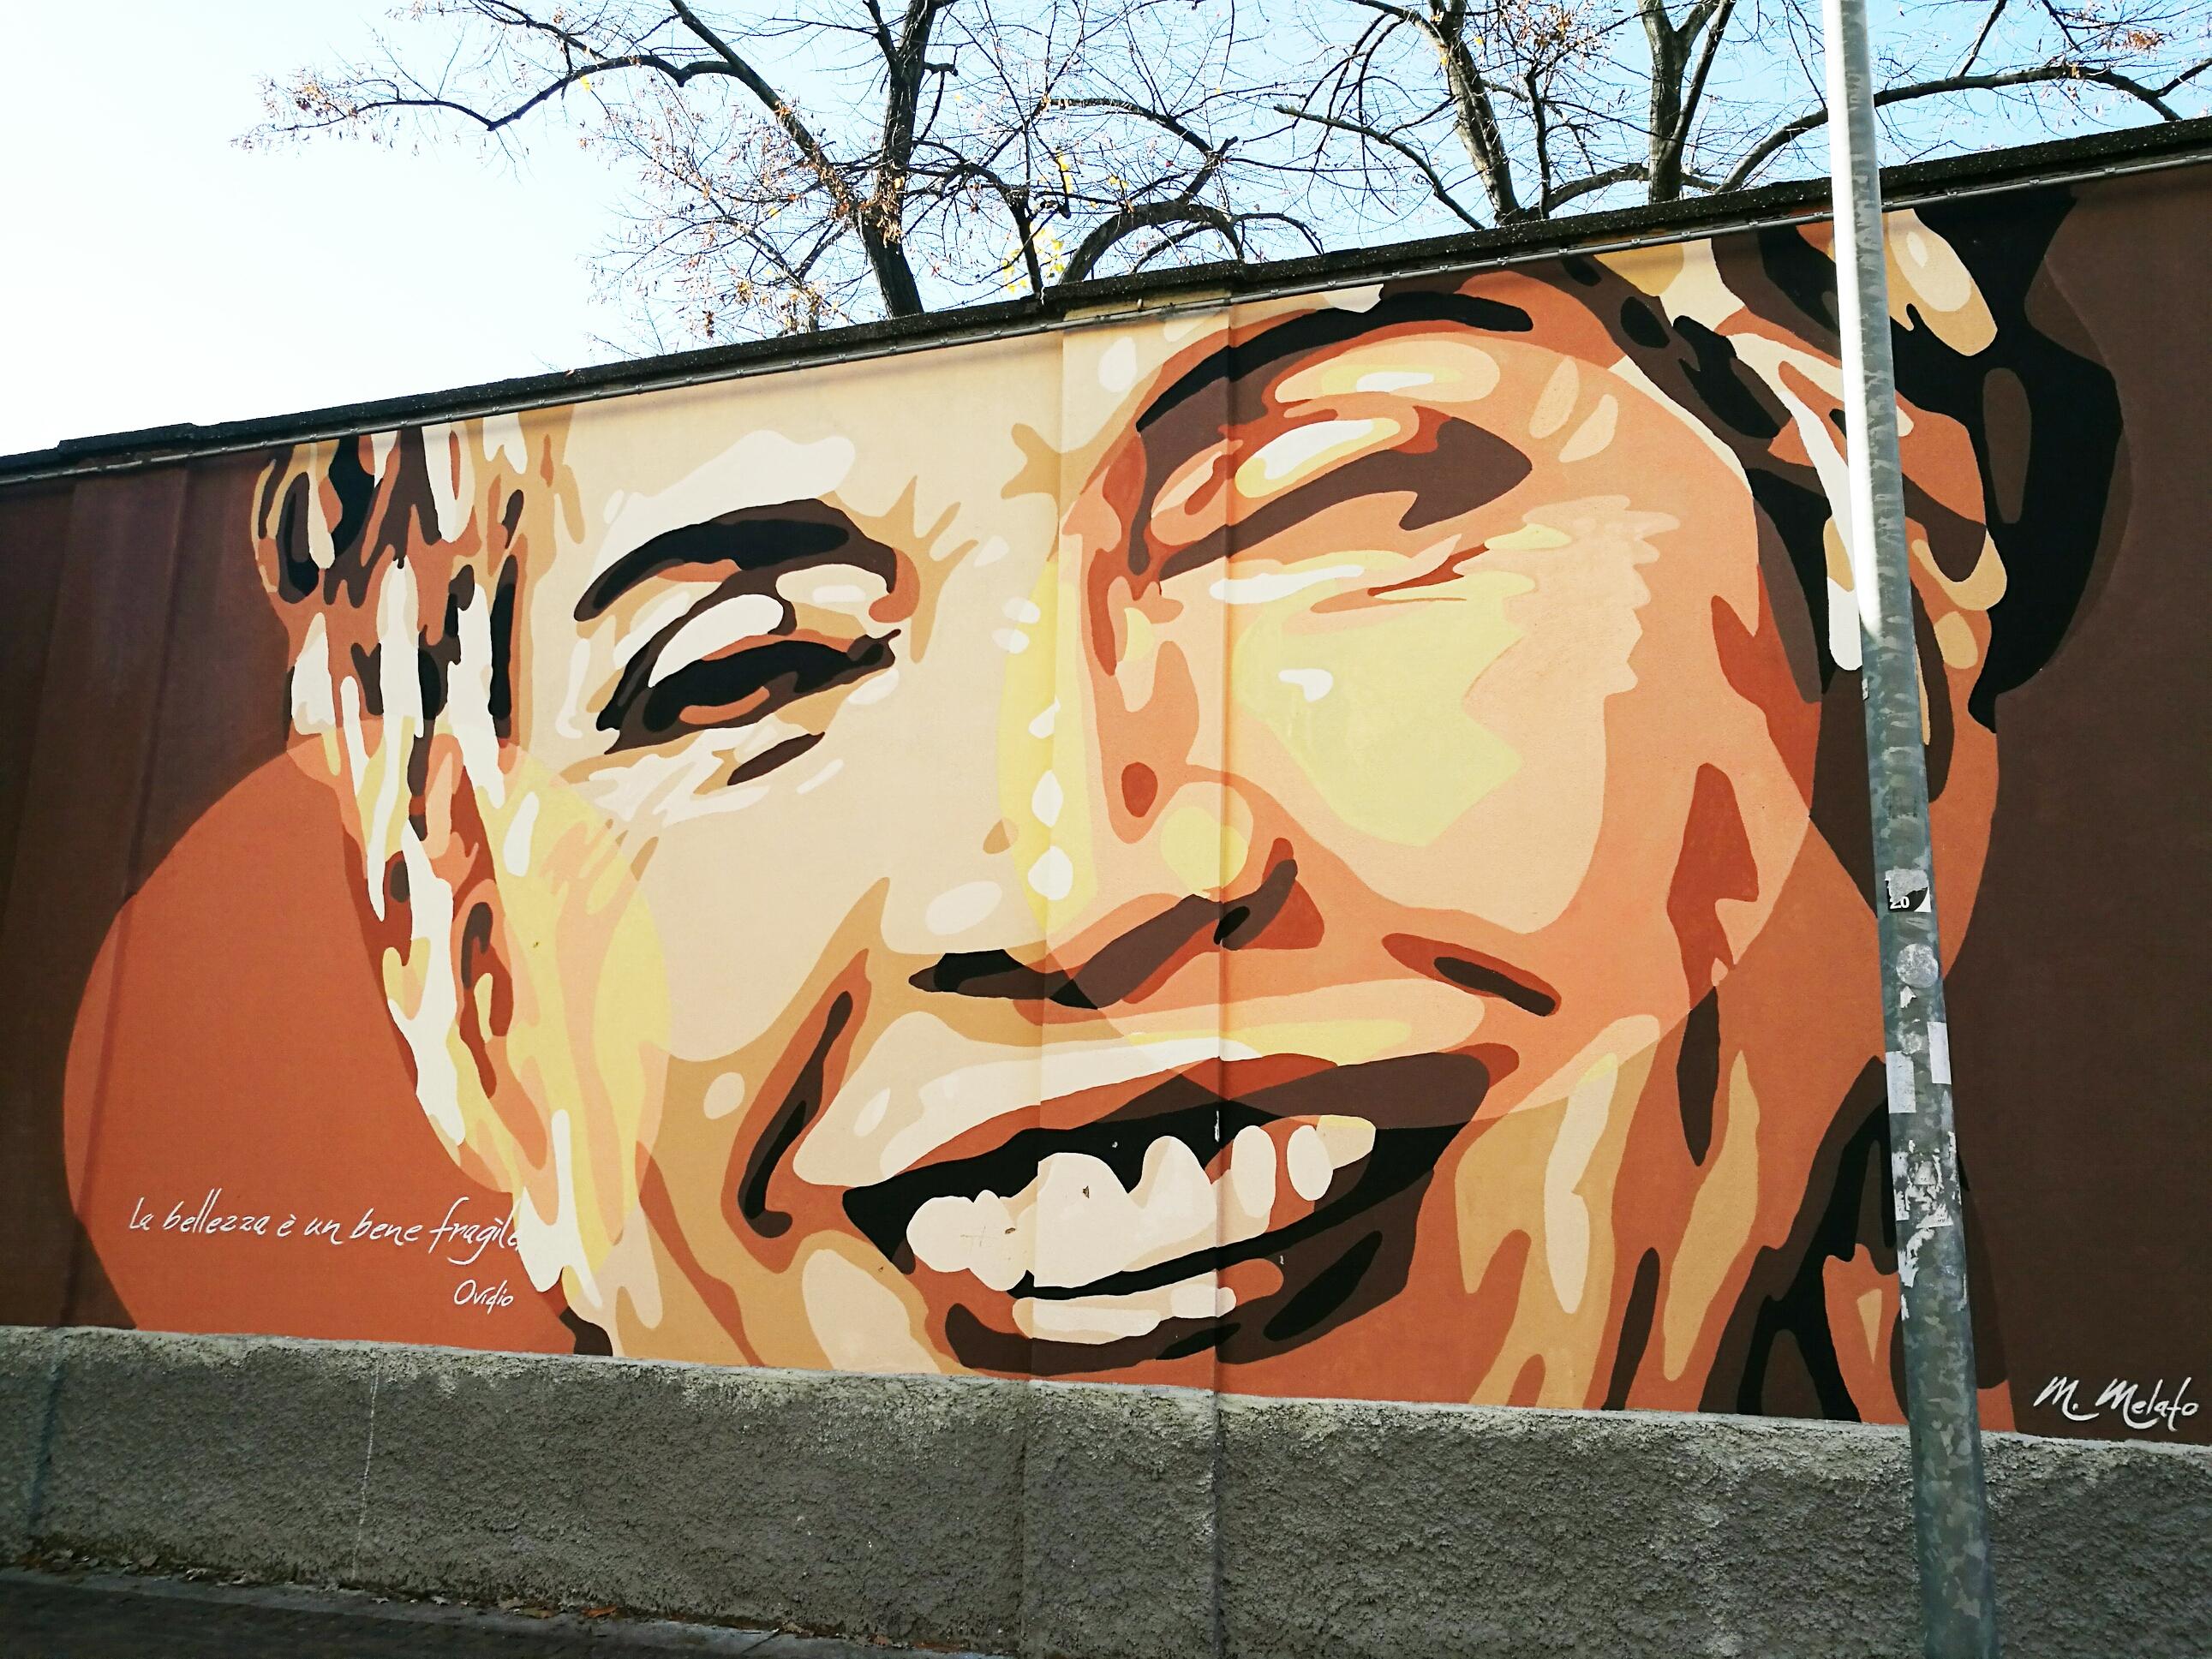 street art orticanoodles